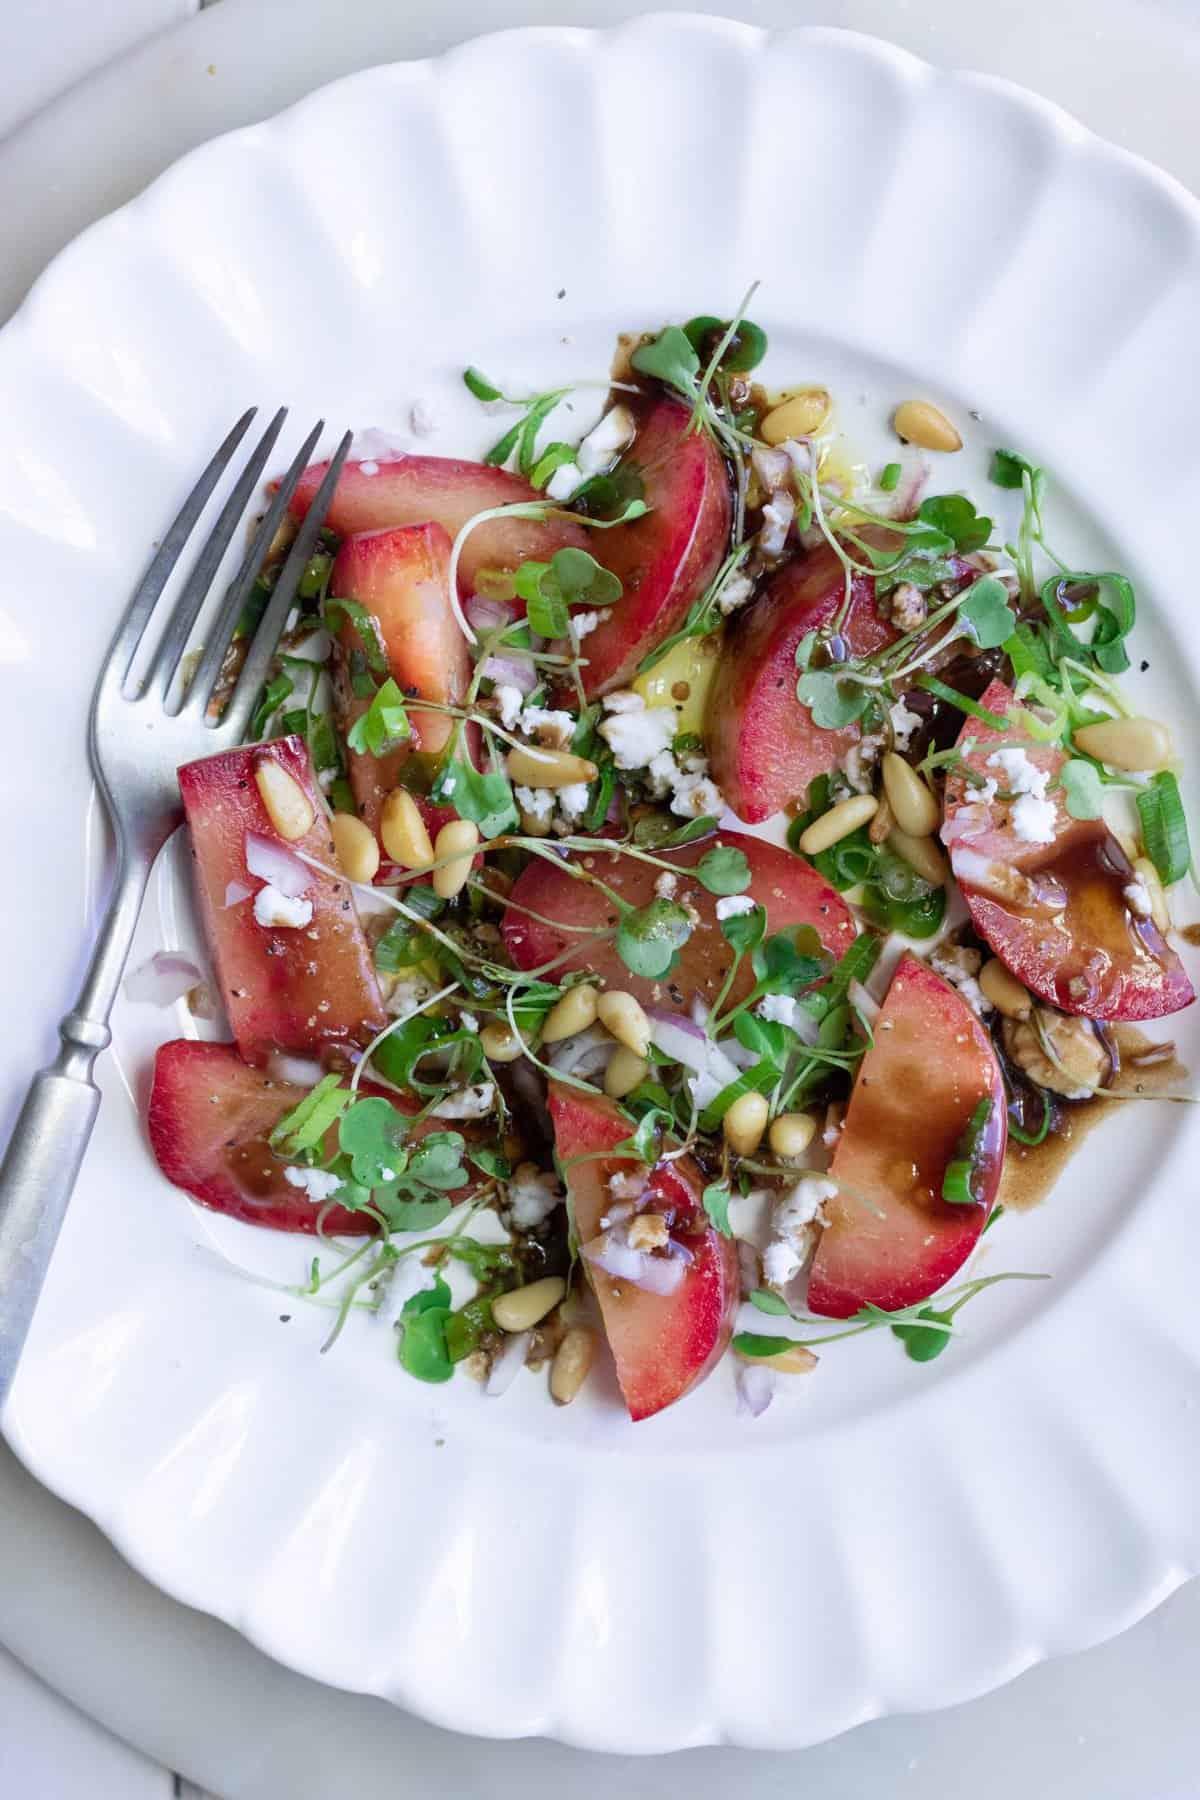 Vegan Plumcot Salad